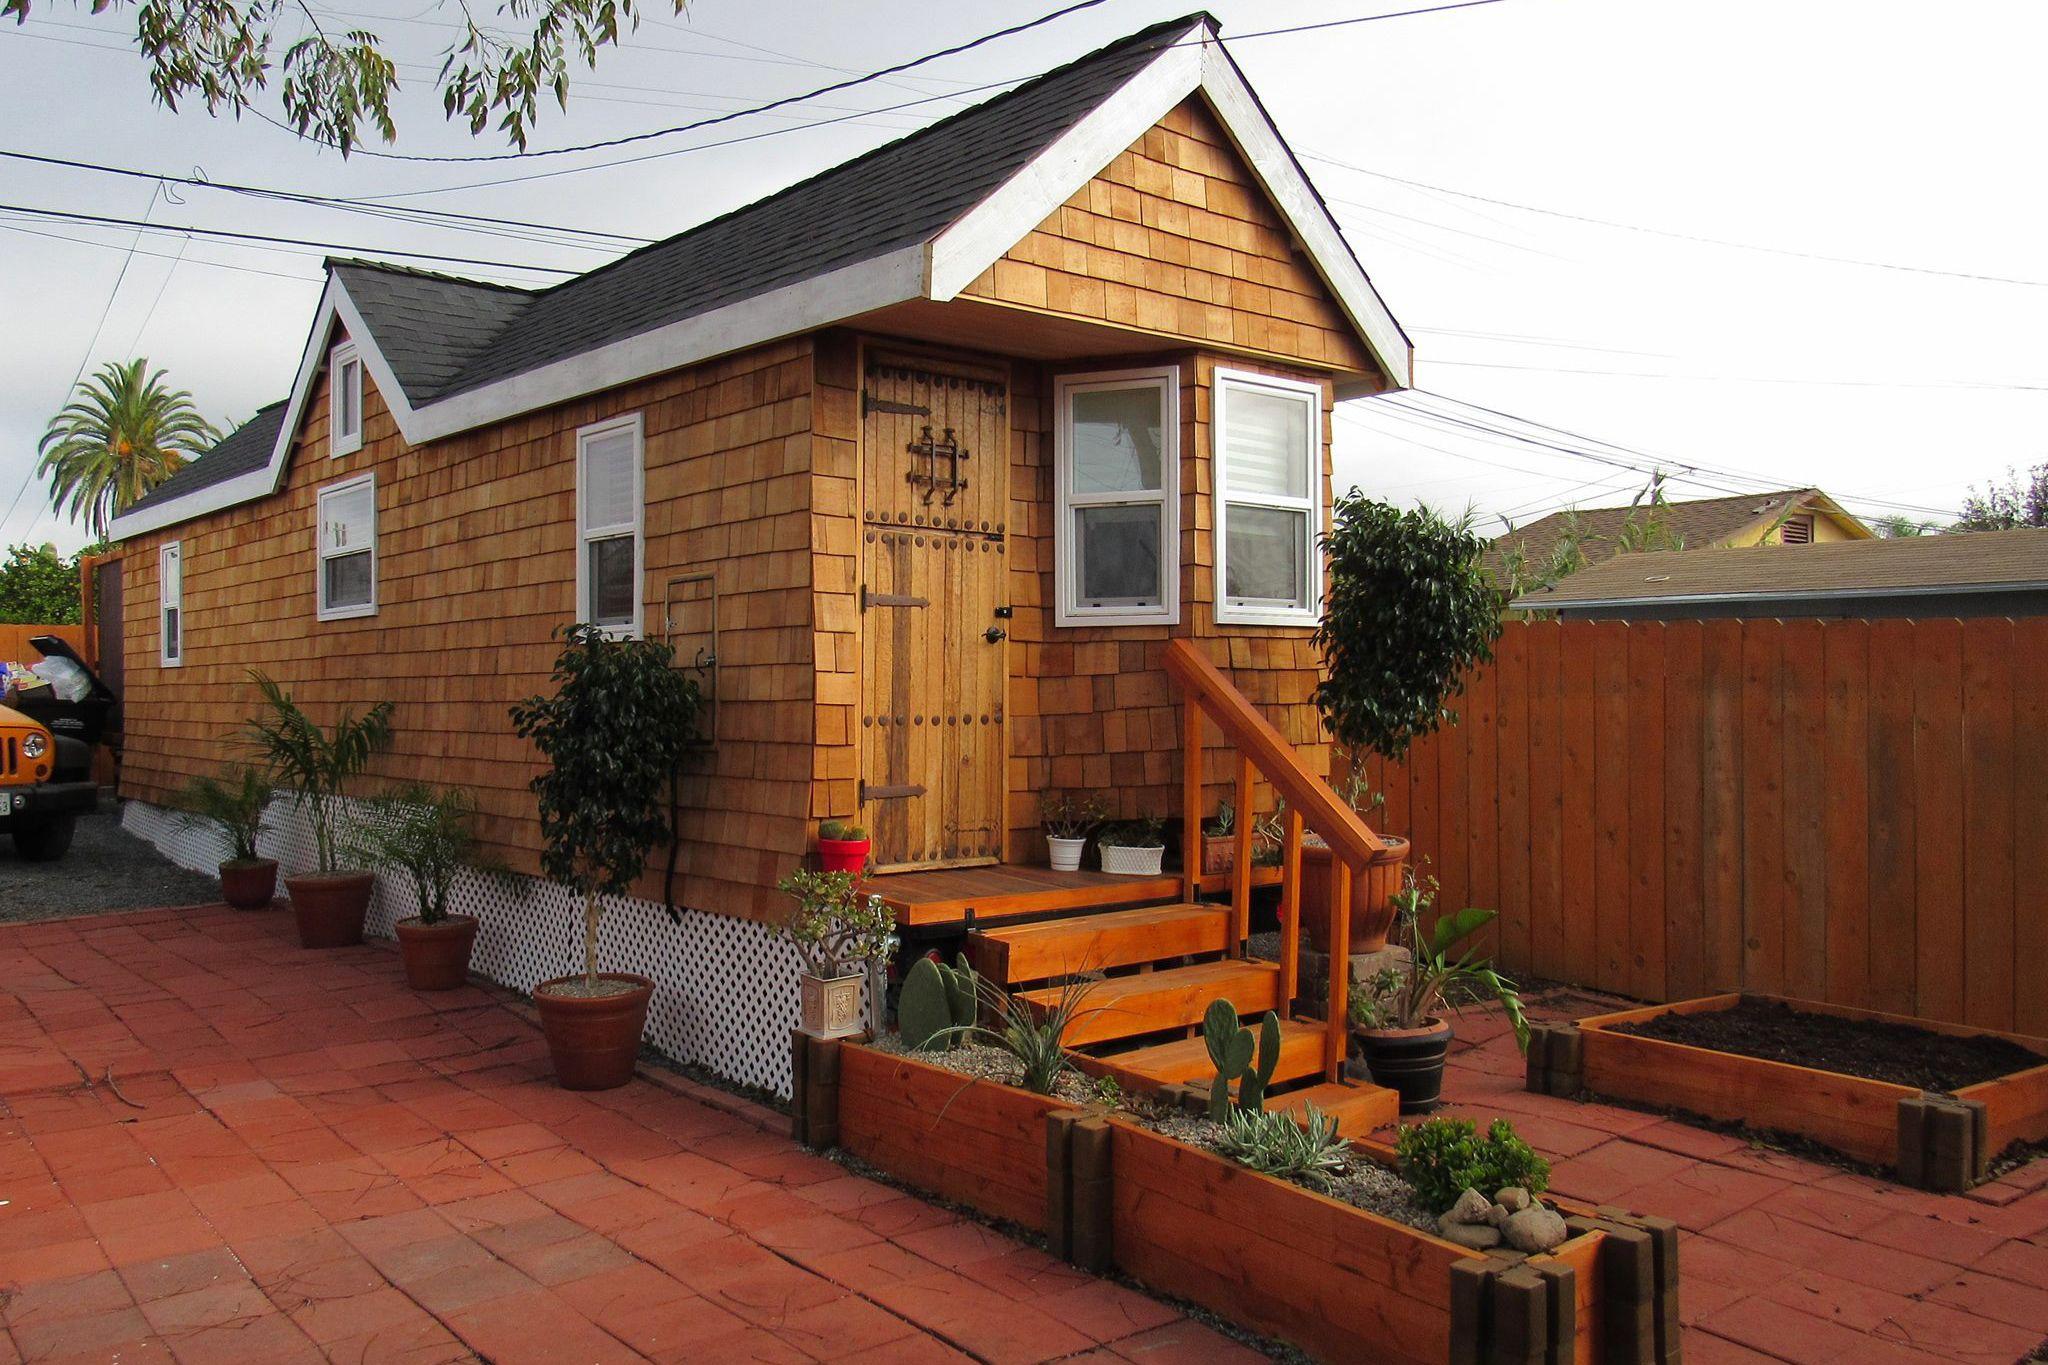 Livable Tiny House munities